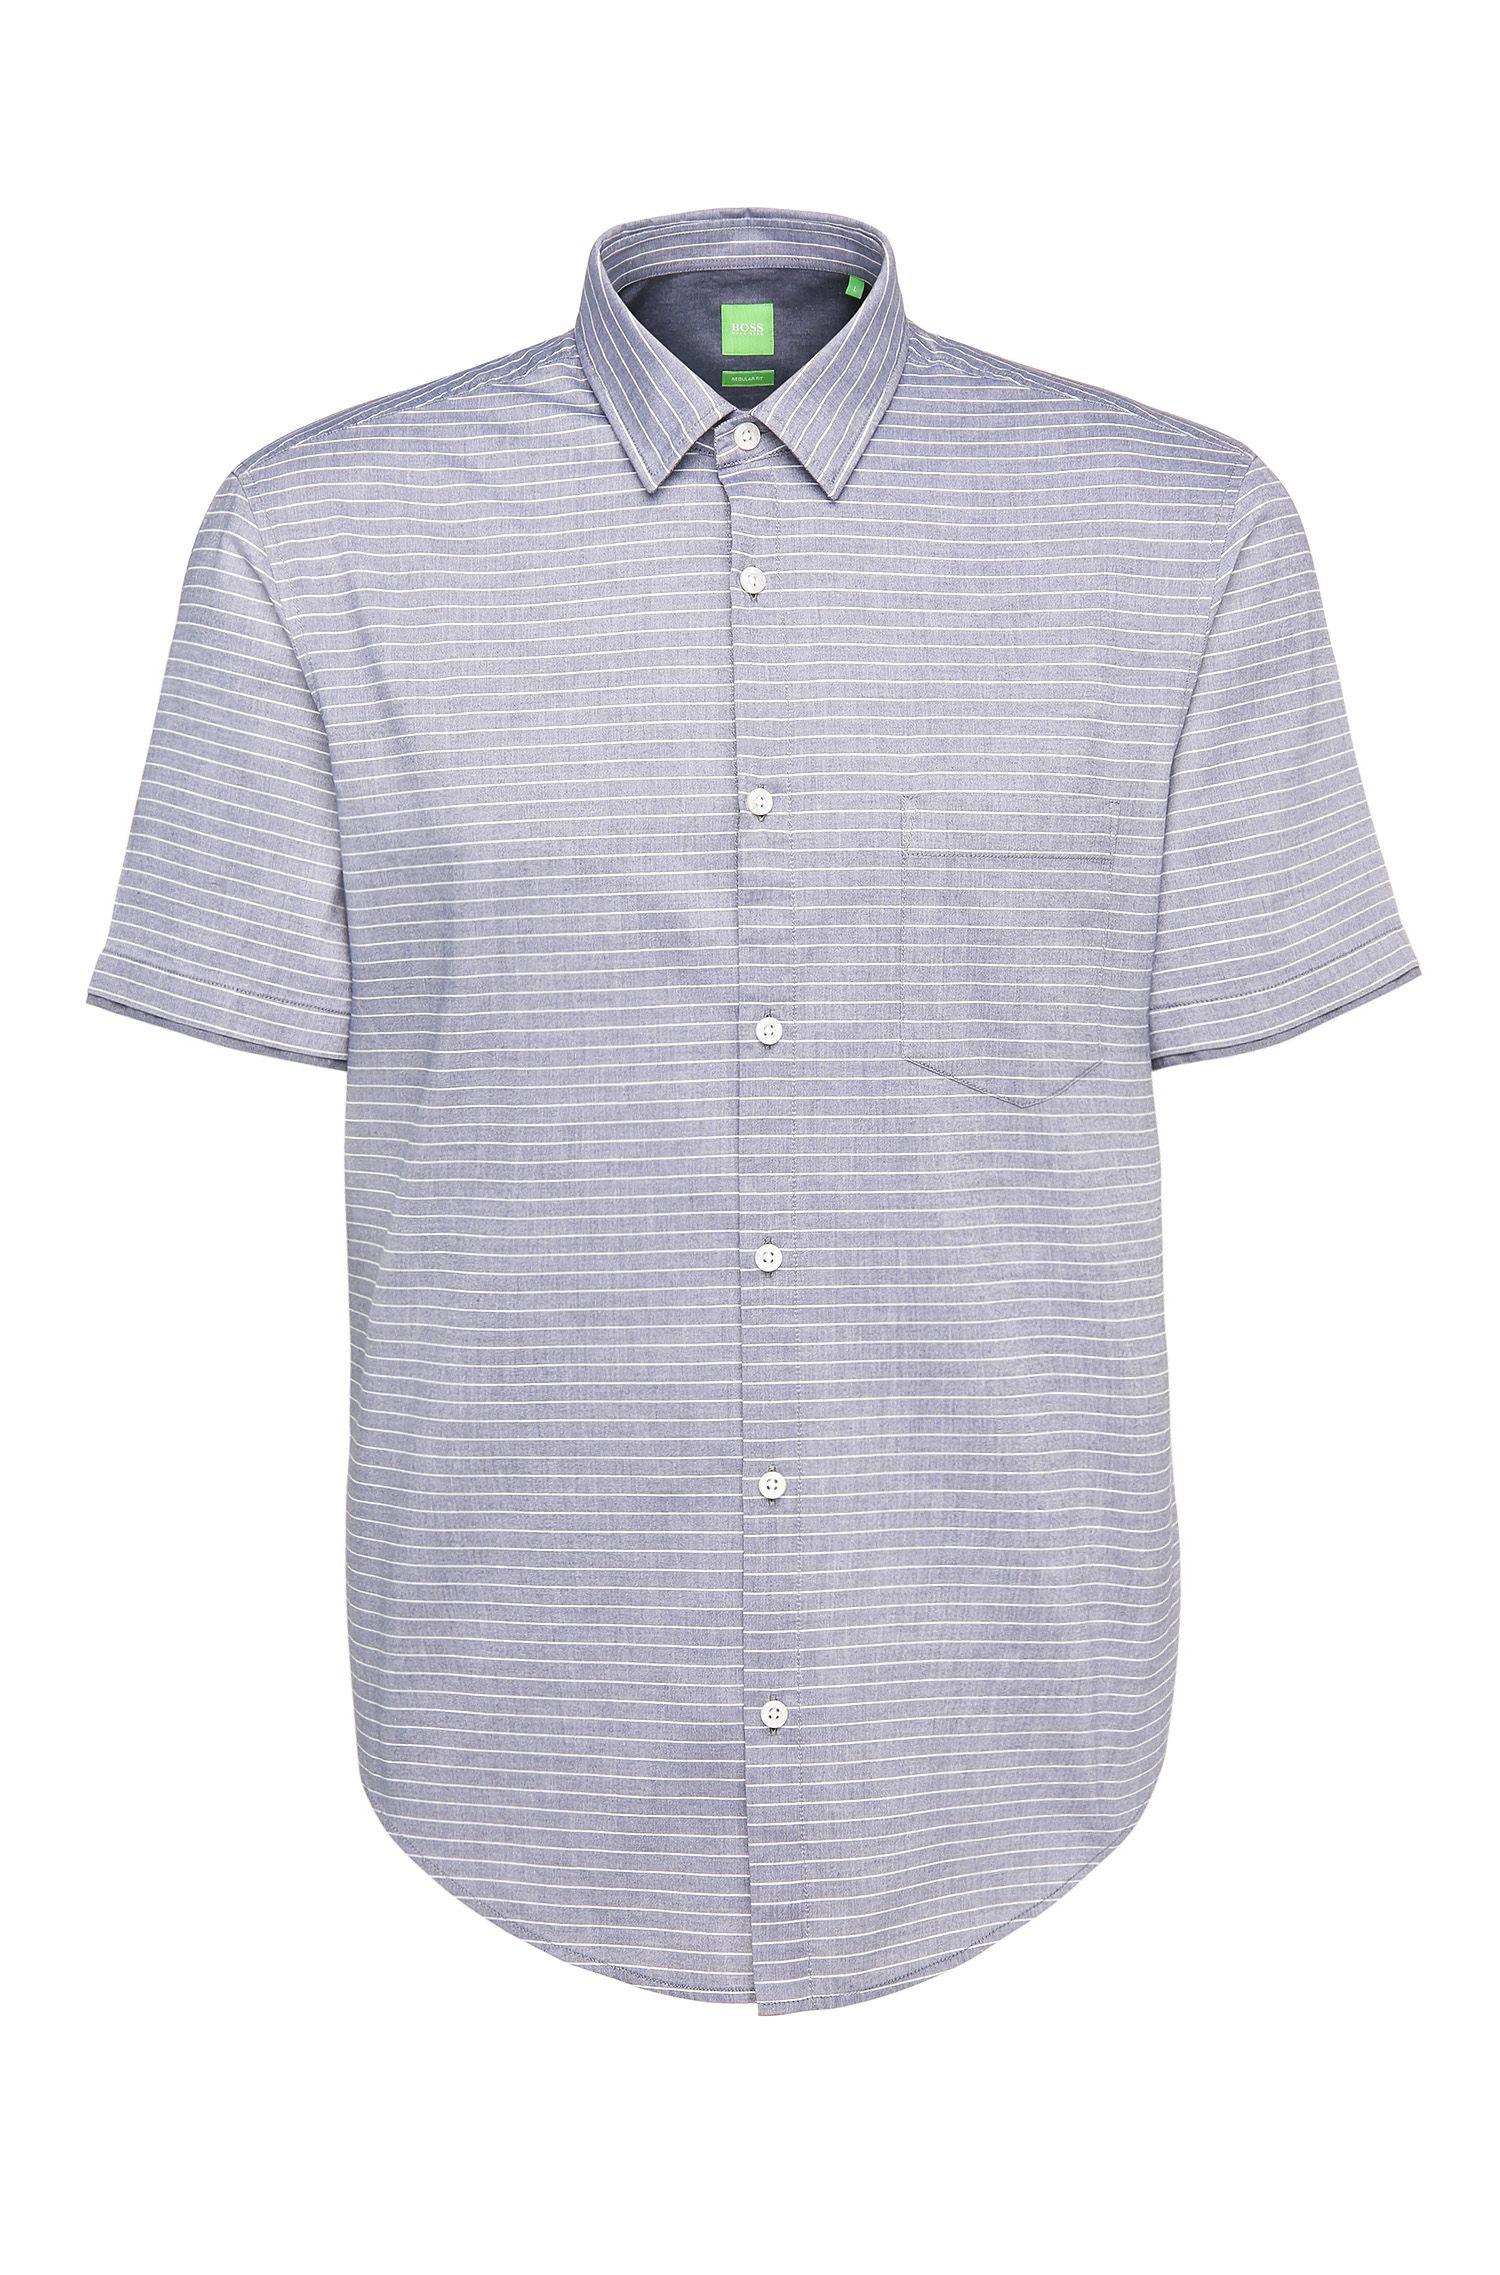 'C-Baulino' | Regular Fit, Cotton Striped Button Down Shirt